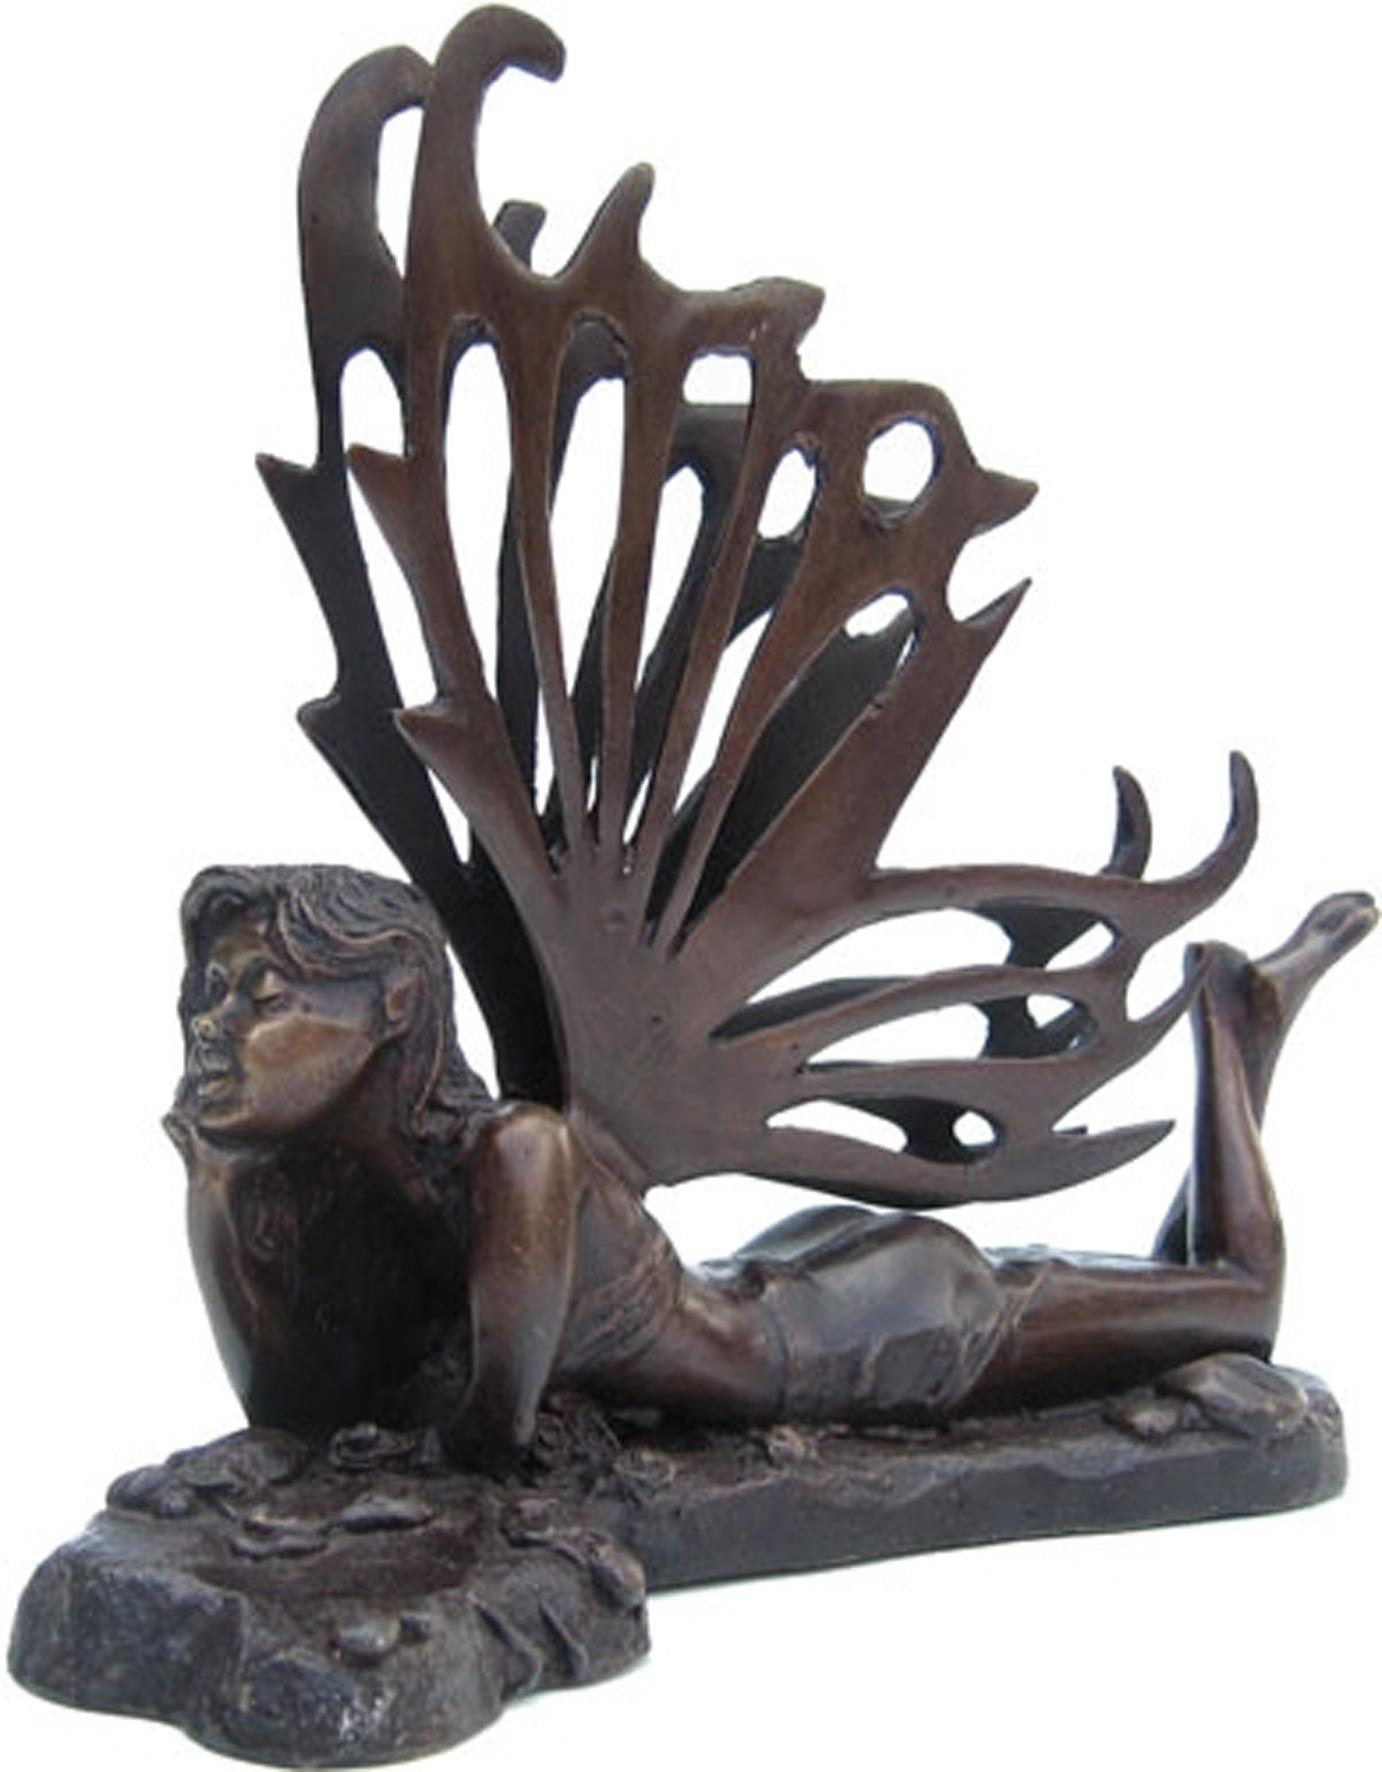 Contemporary Bronze Fantasy Statue 'Dreaming Elf'